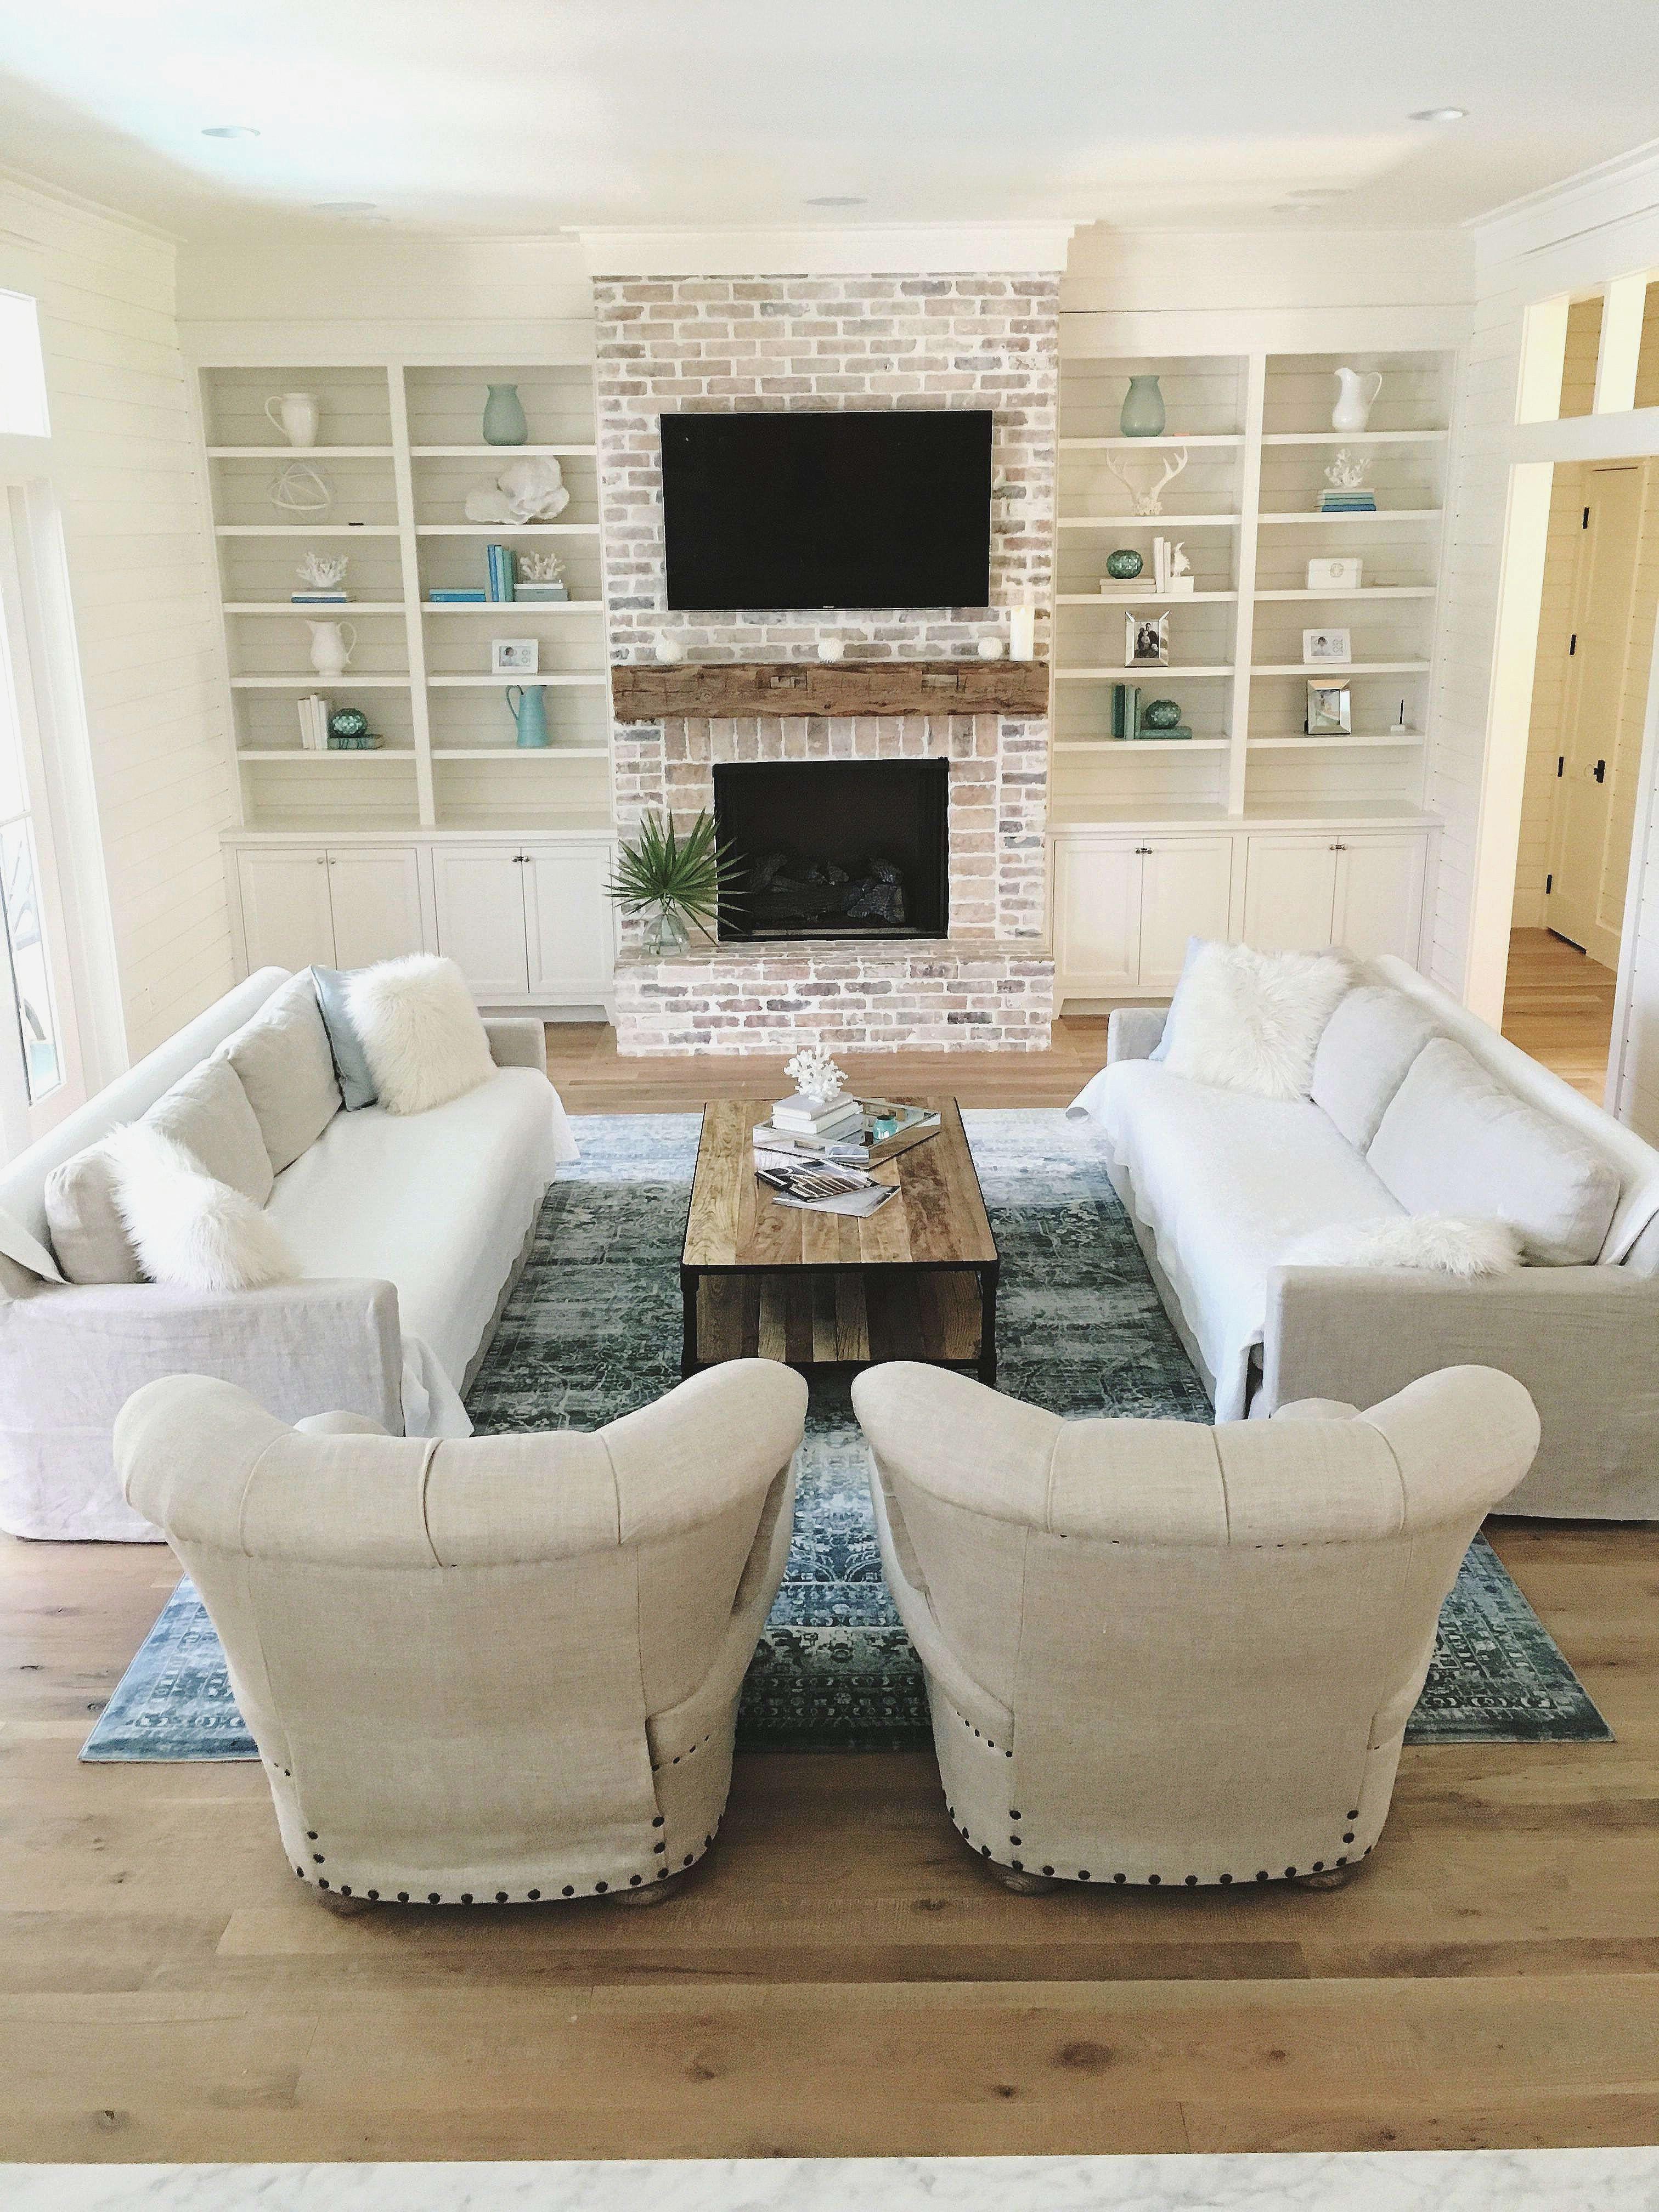 Cool Show Home Decorating Ideas Of Furniturenew Furniture Design Great Unique Acnn Decor